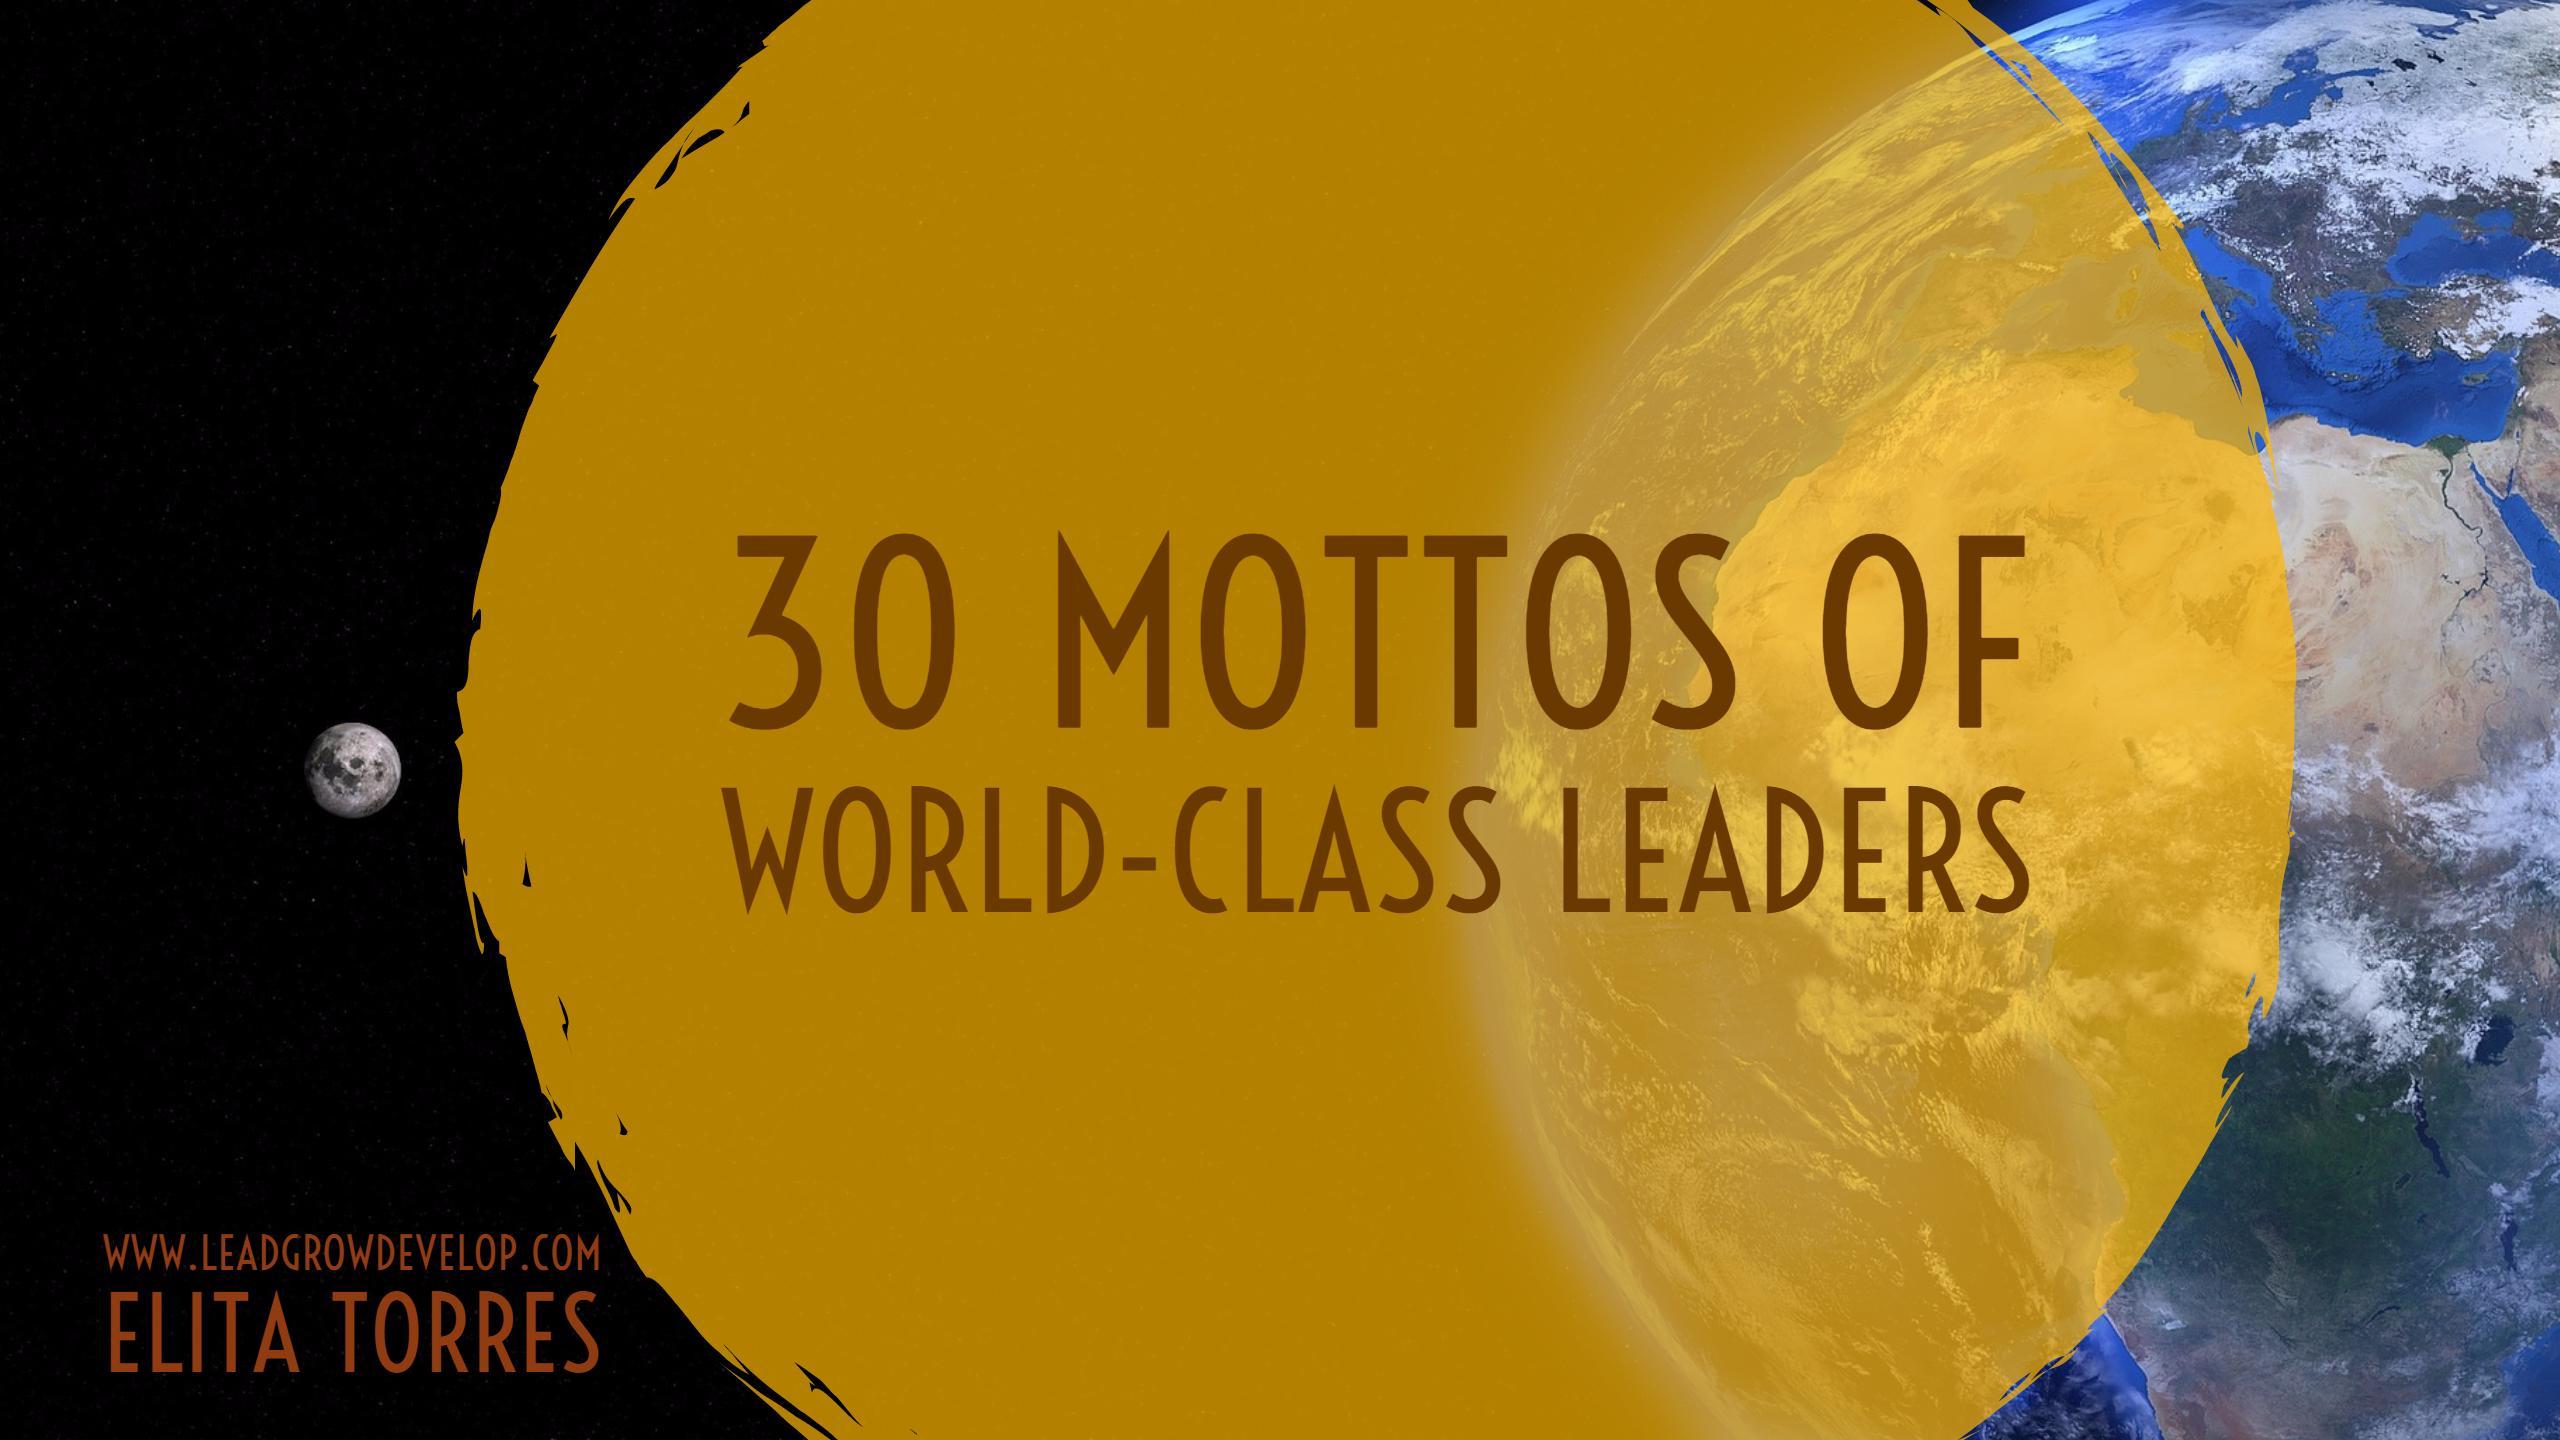 30-mottos-of-world-class-leaders